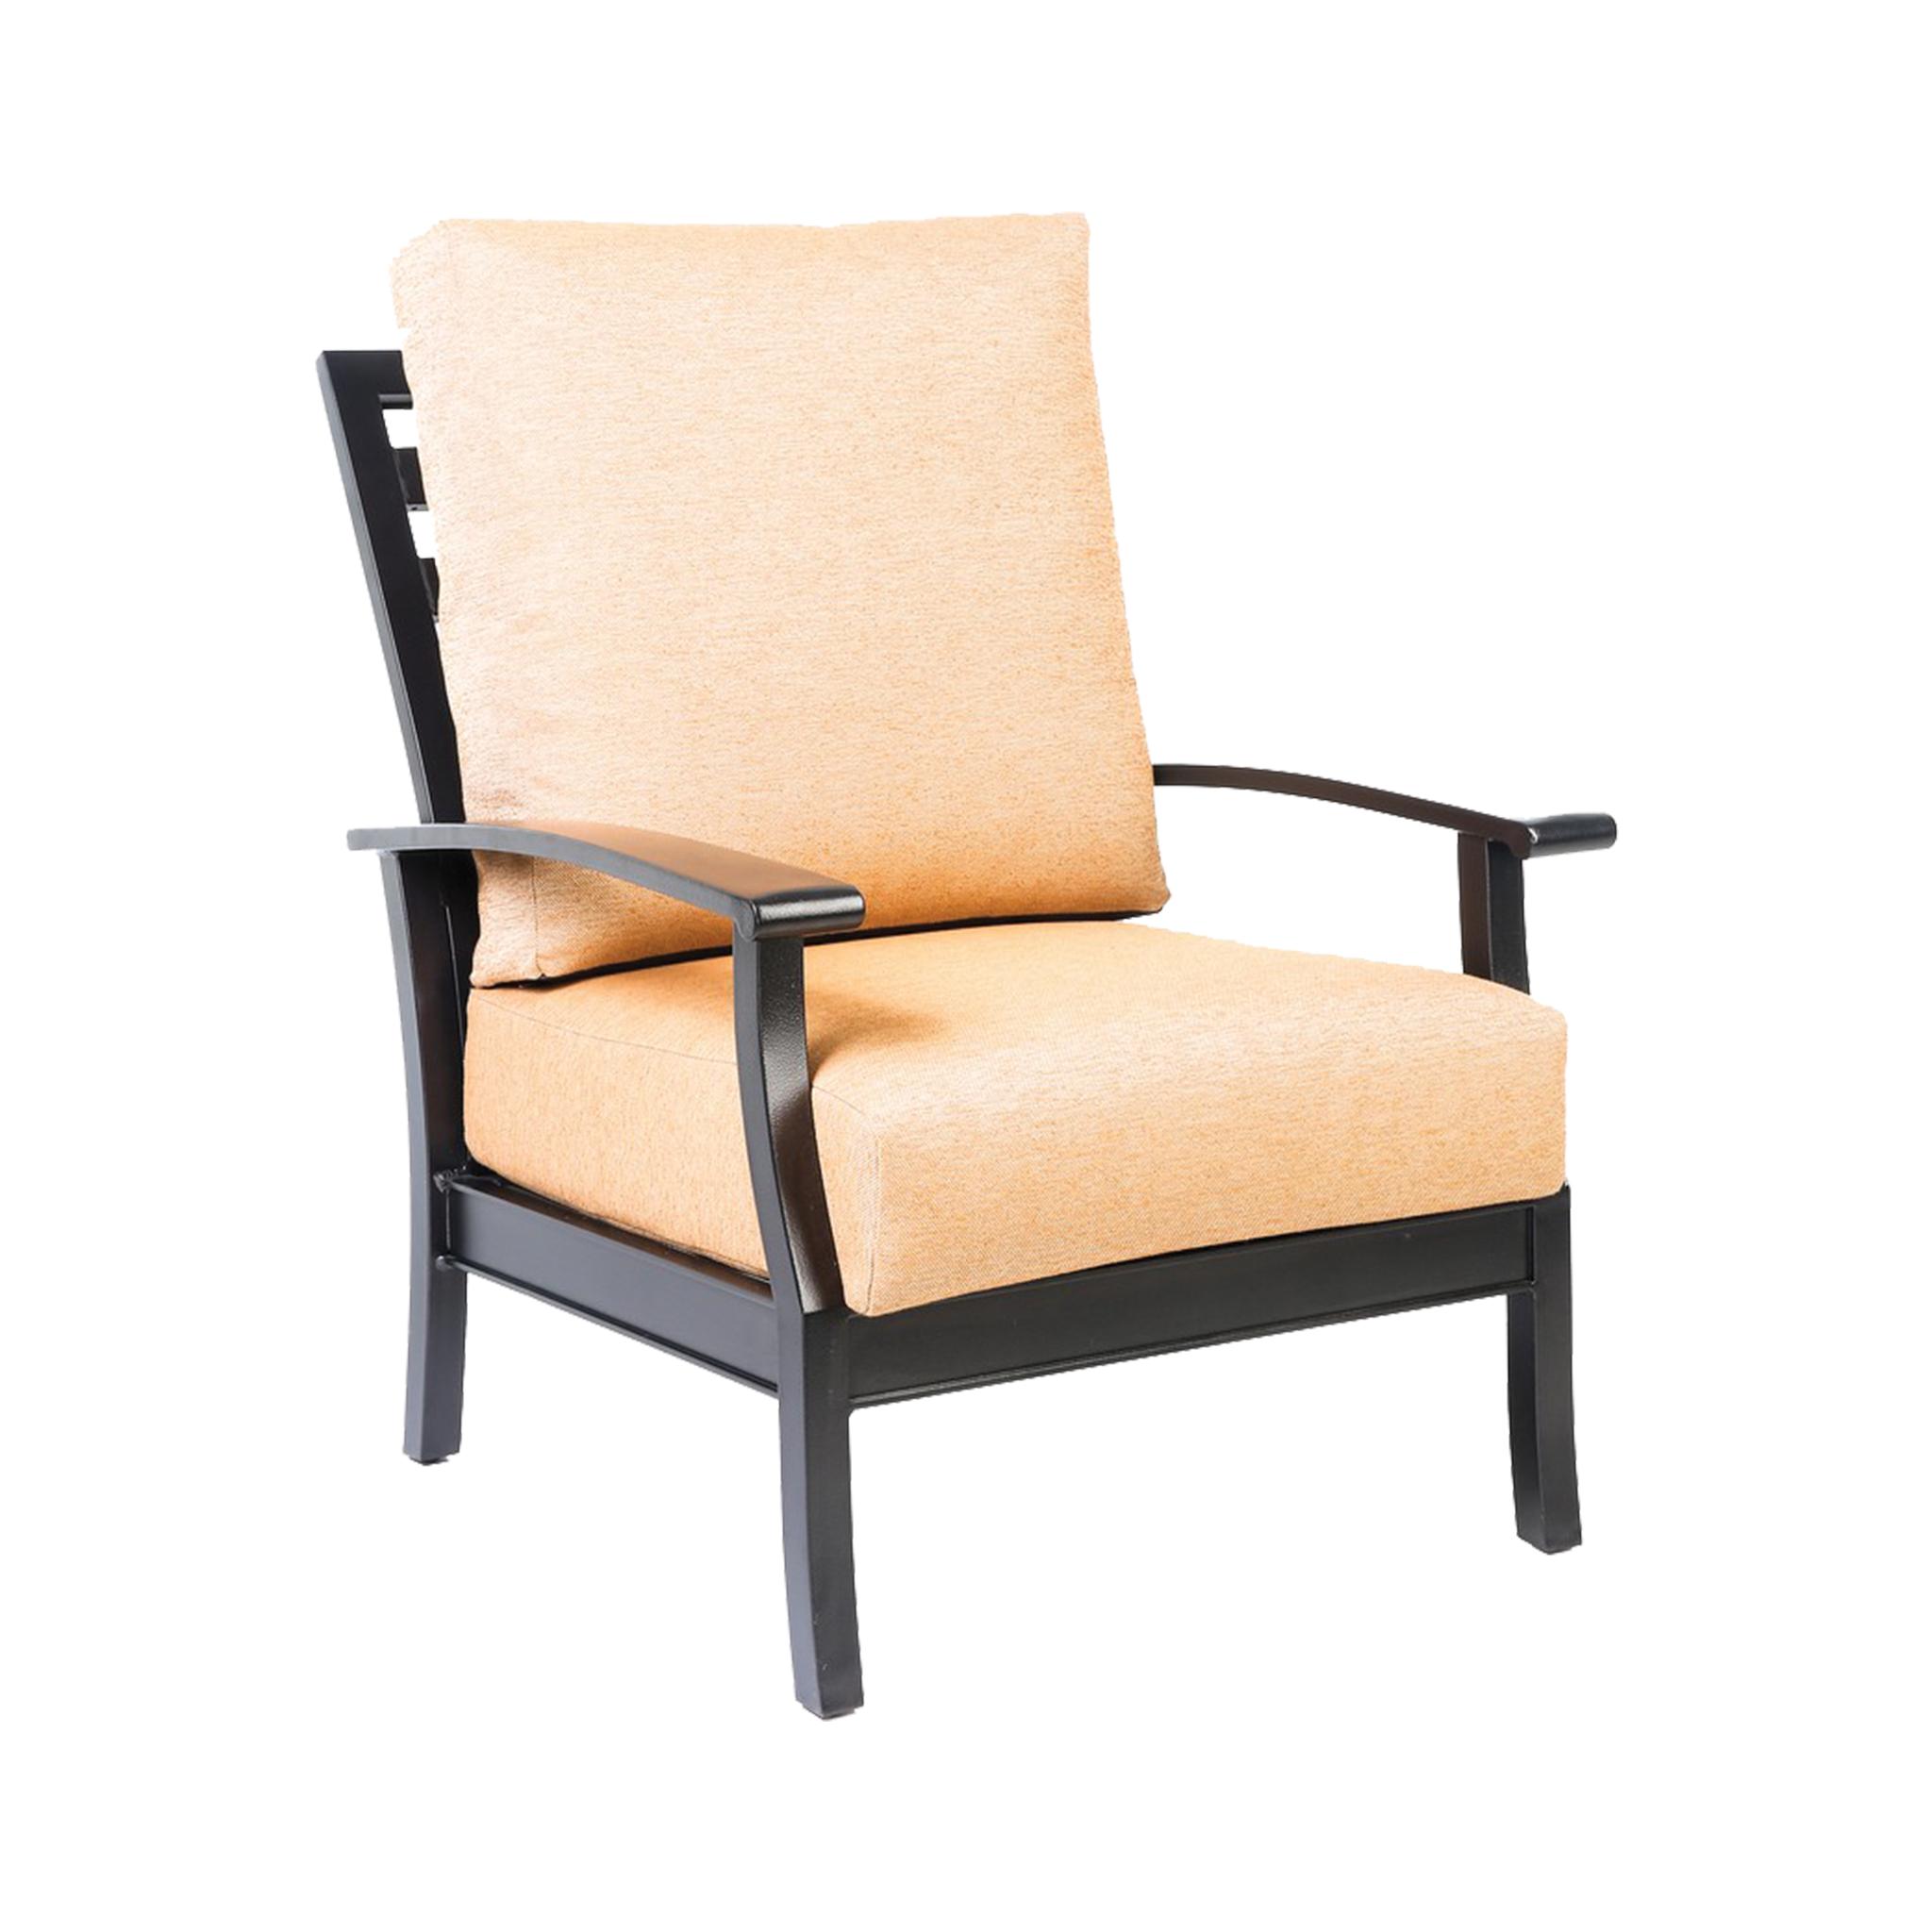 Sunbrite Outdoor Furniture